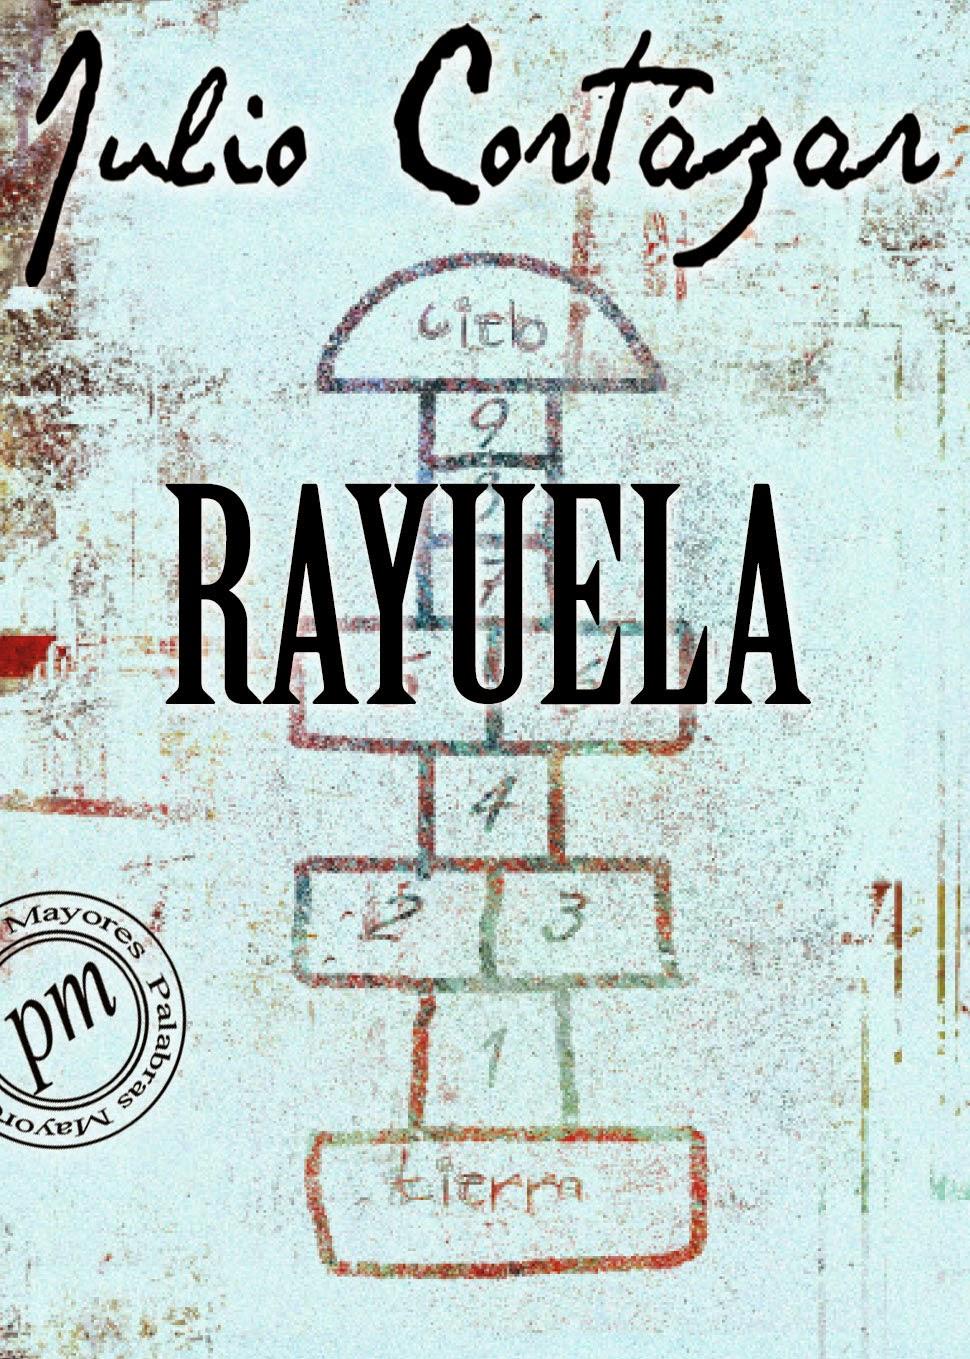 Rayuela – Julio Cortazar